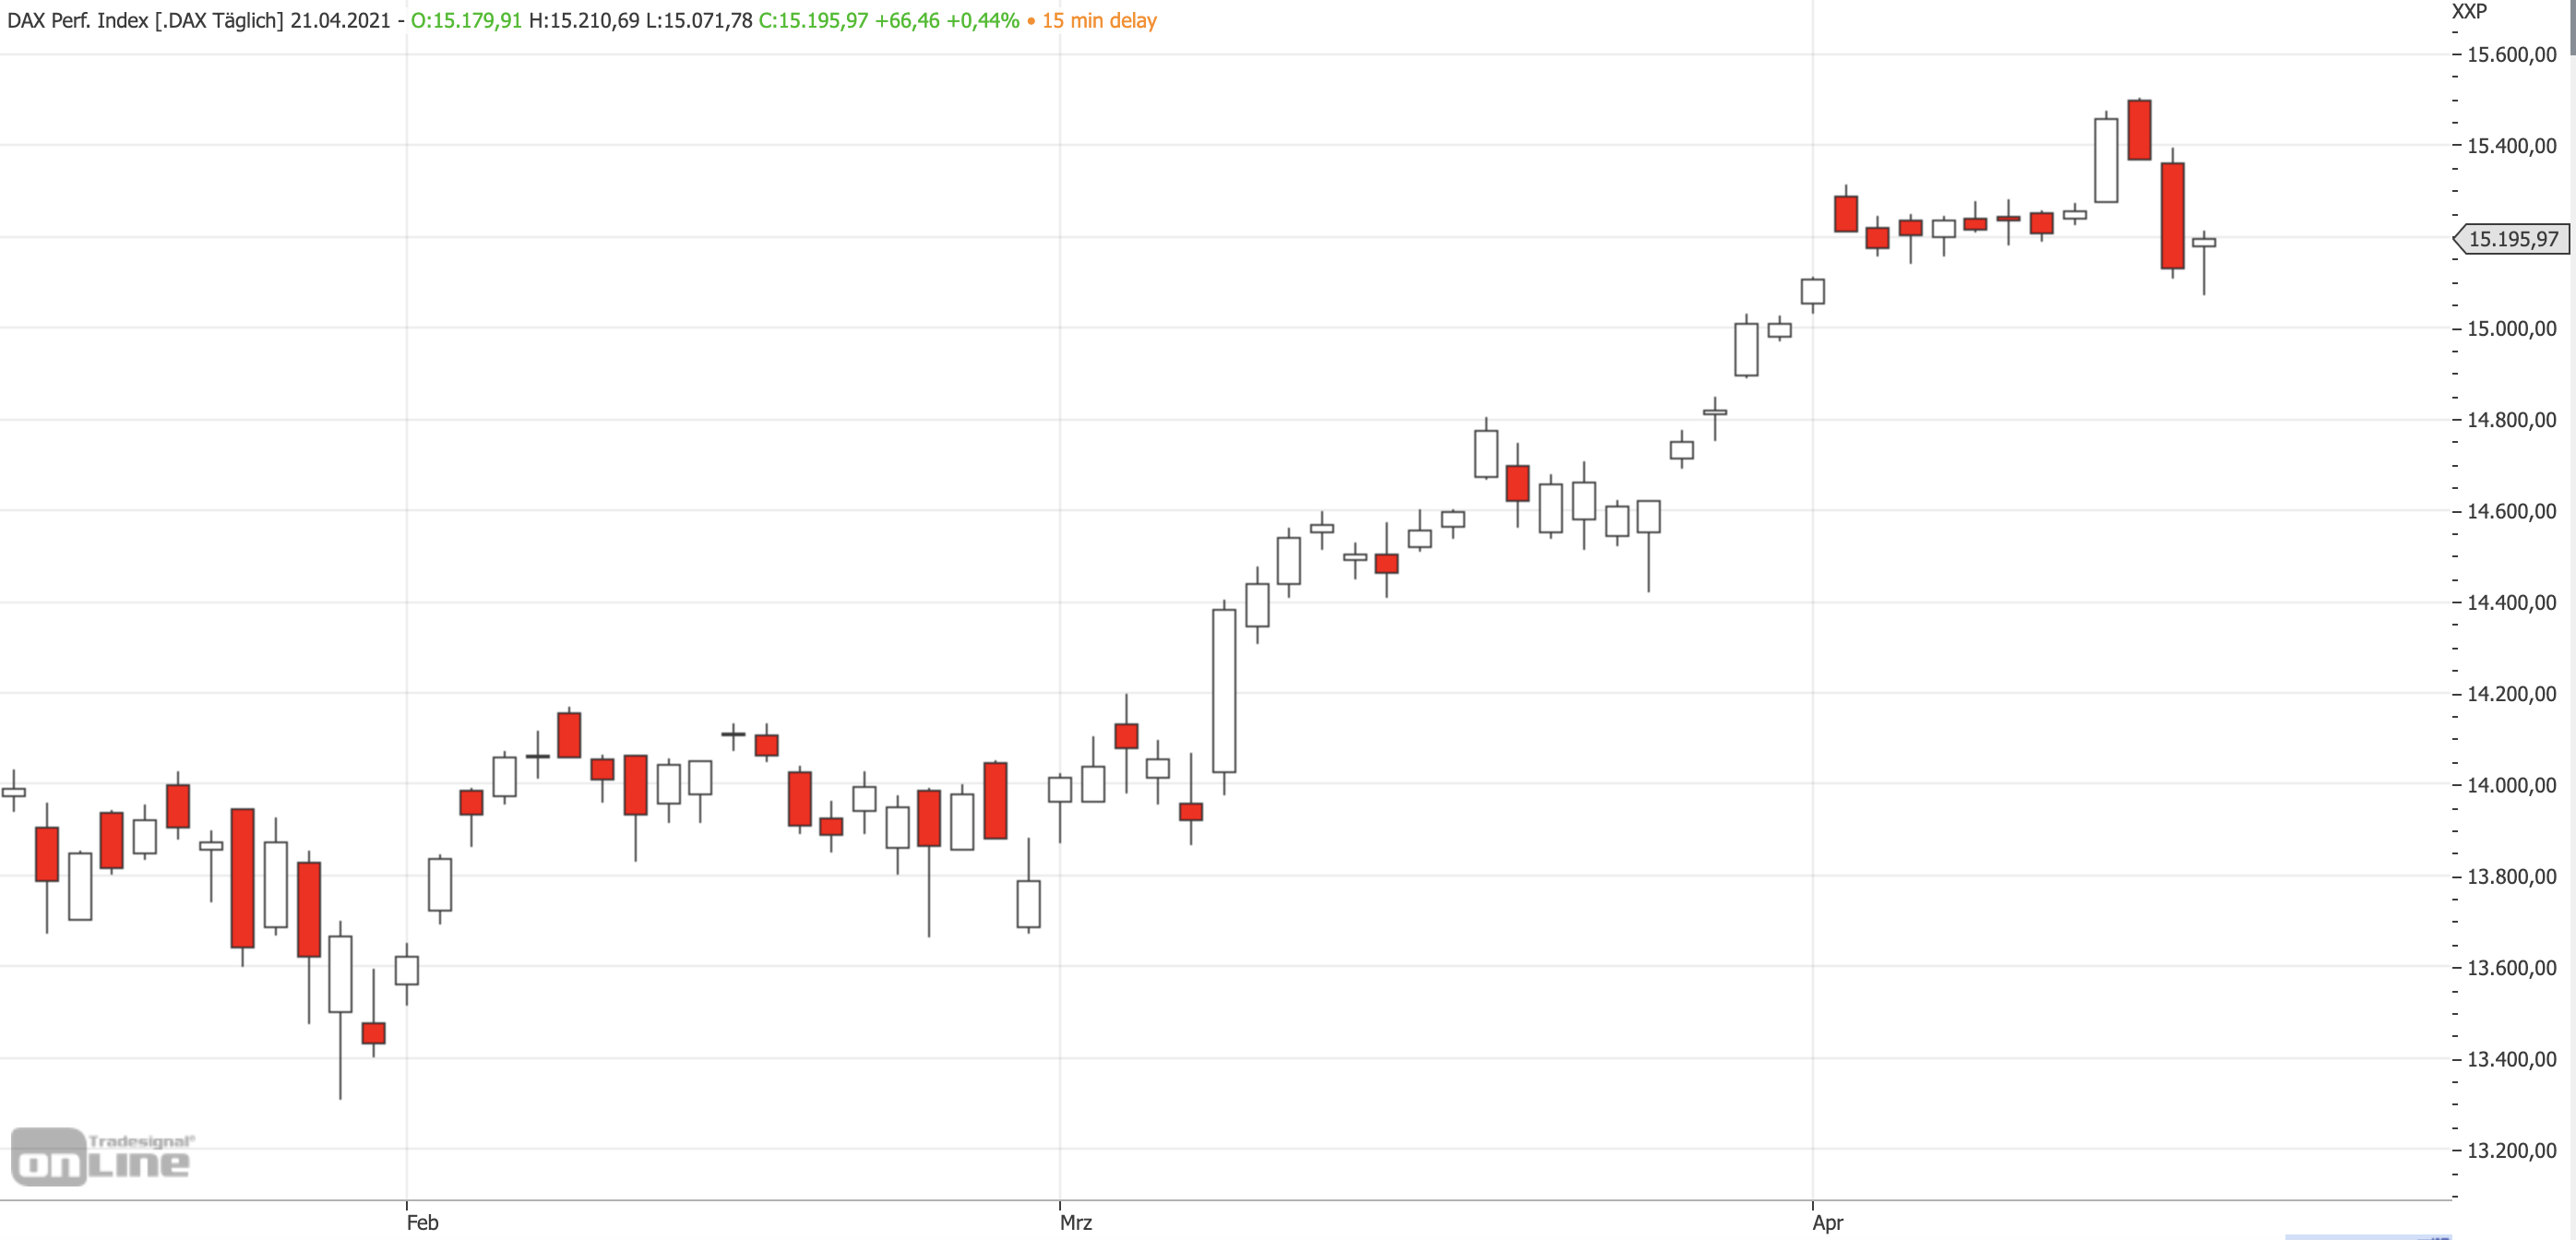 Mittelfristiger DAX-Chart am 21.04.2021